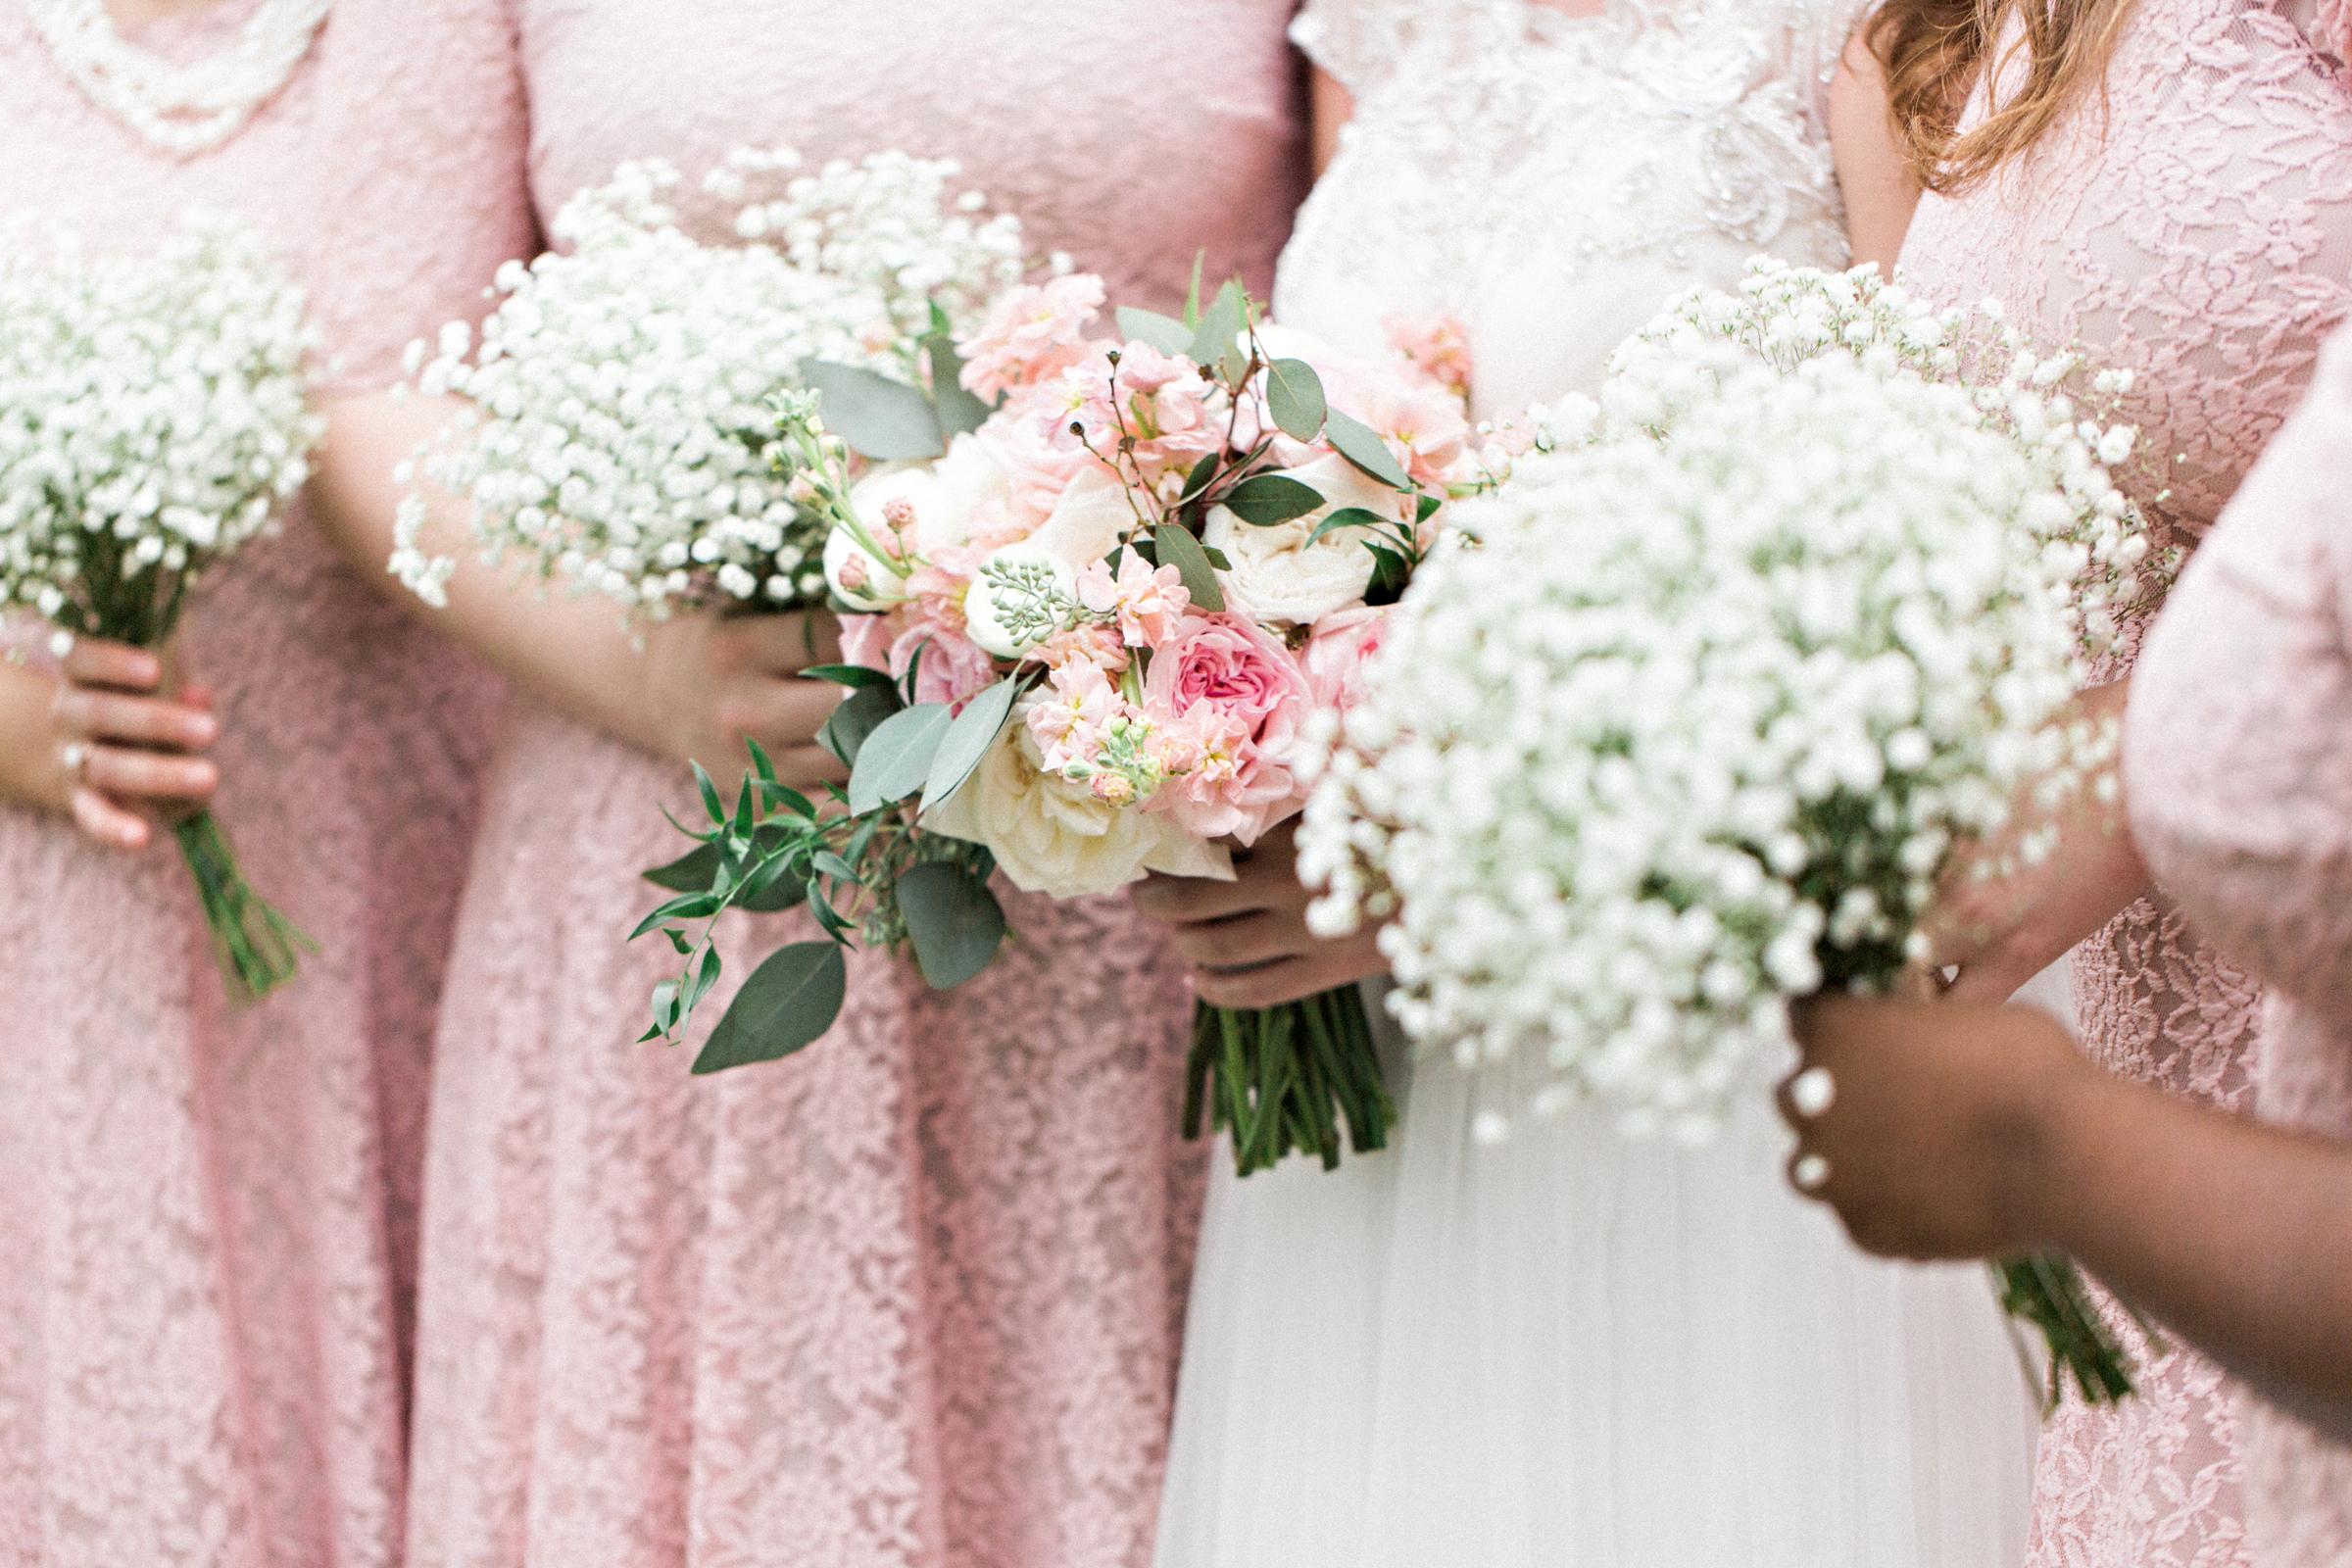 Alabama-Wedding-Photography-Nick-Drollette-Cory-Laura-140.jpg